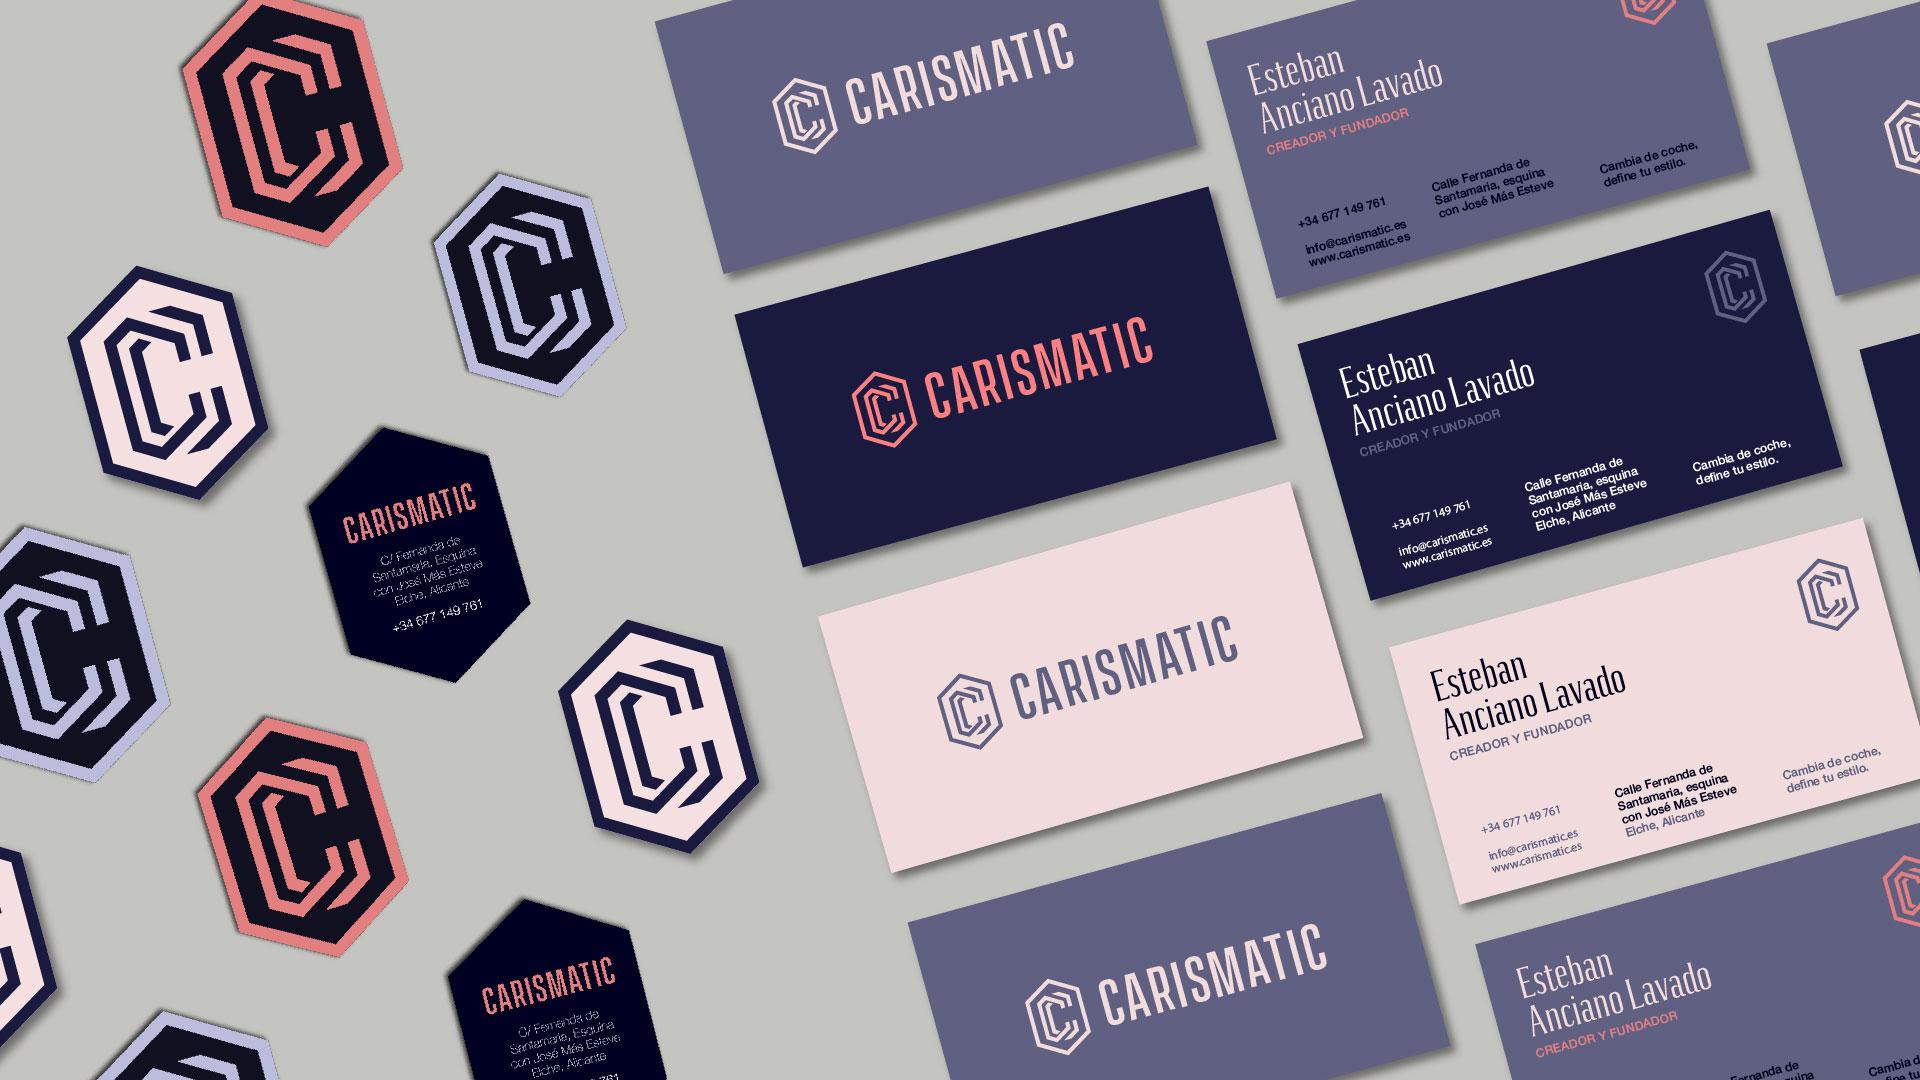 carismatic04